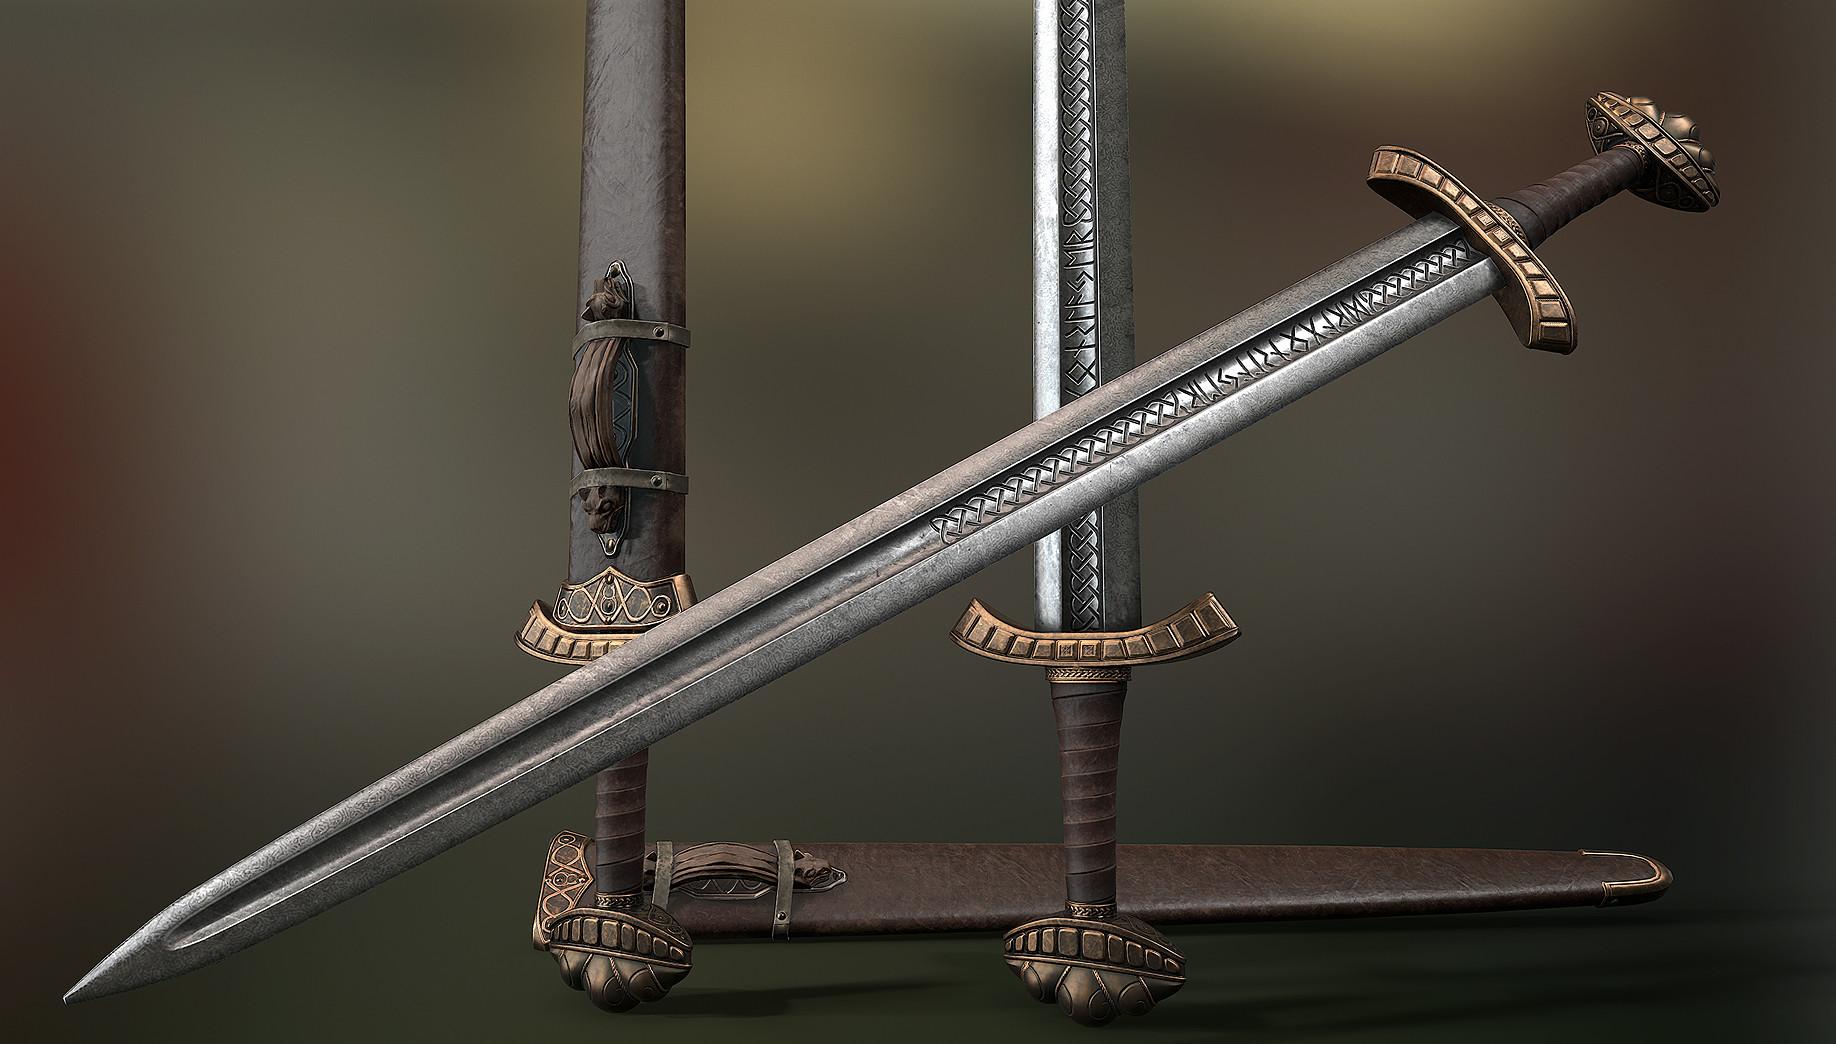 Wiktor ohman sword